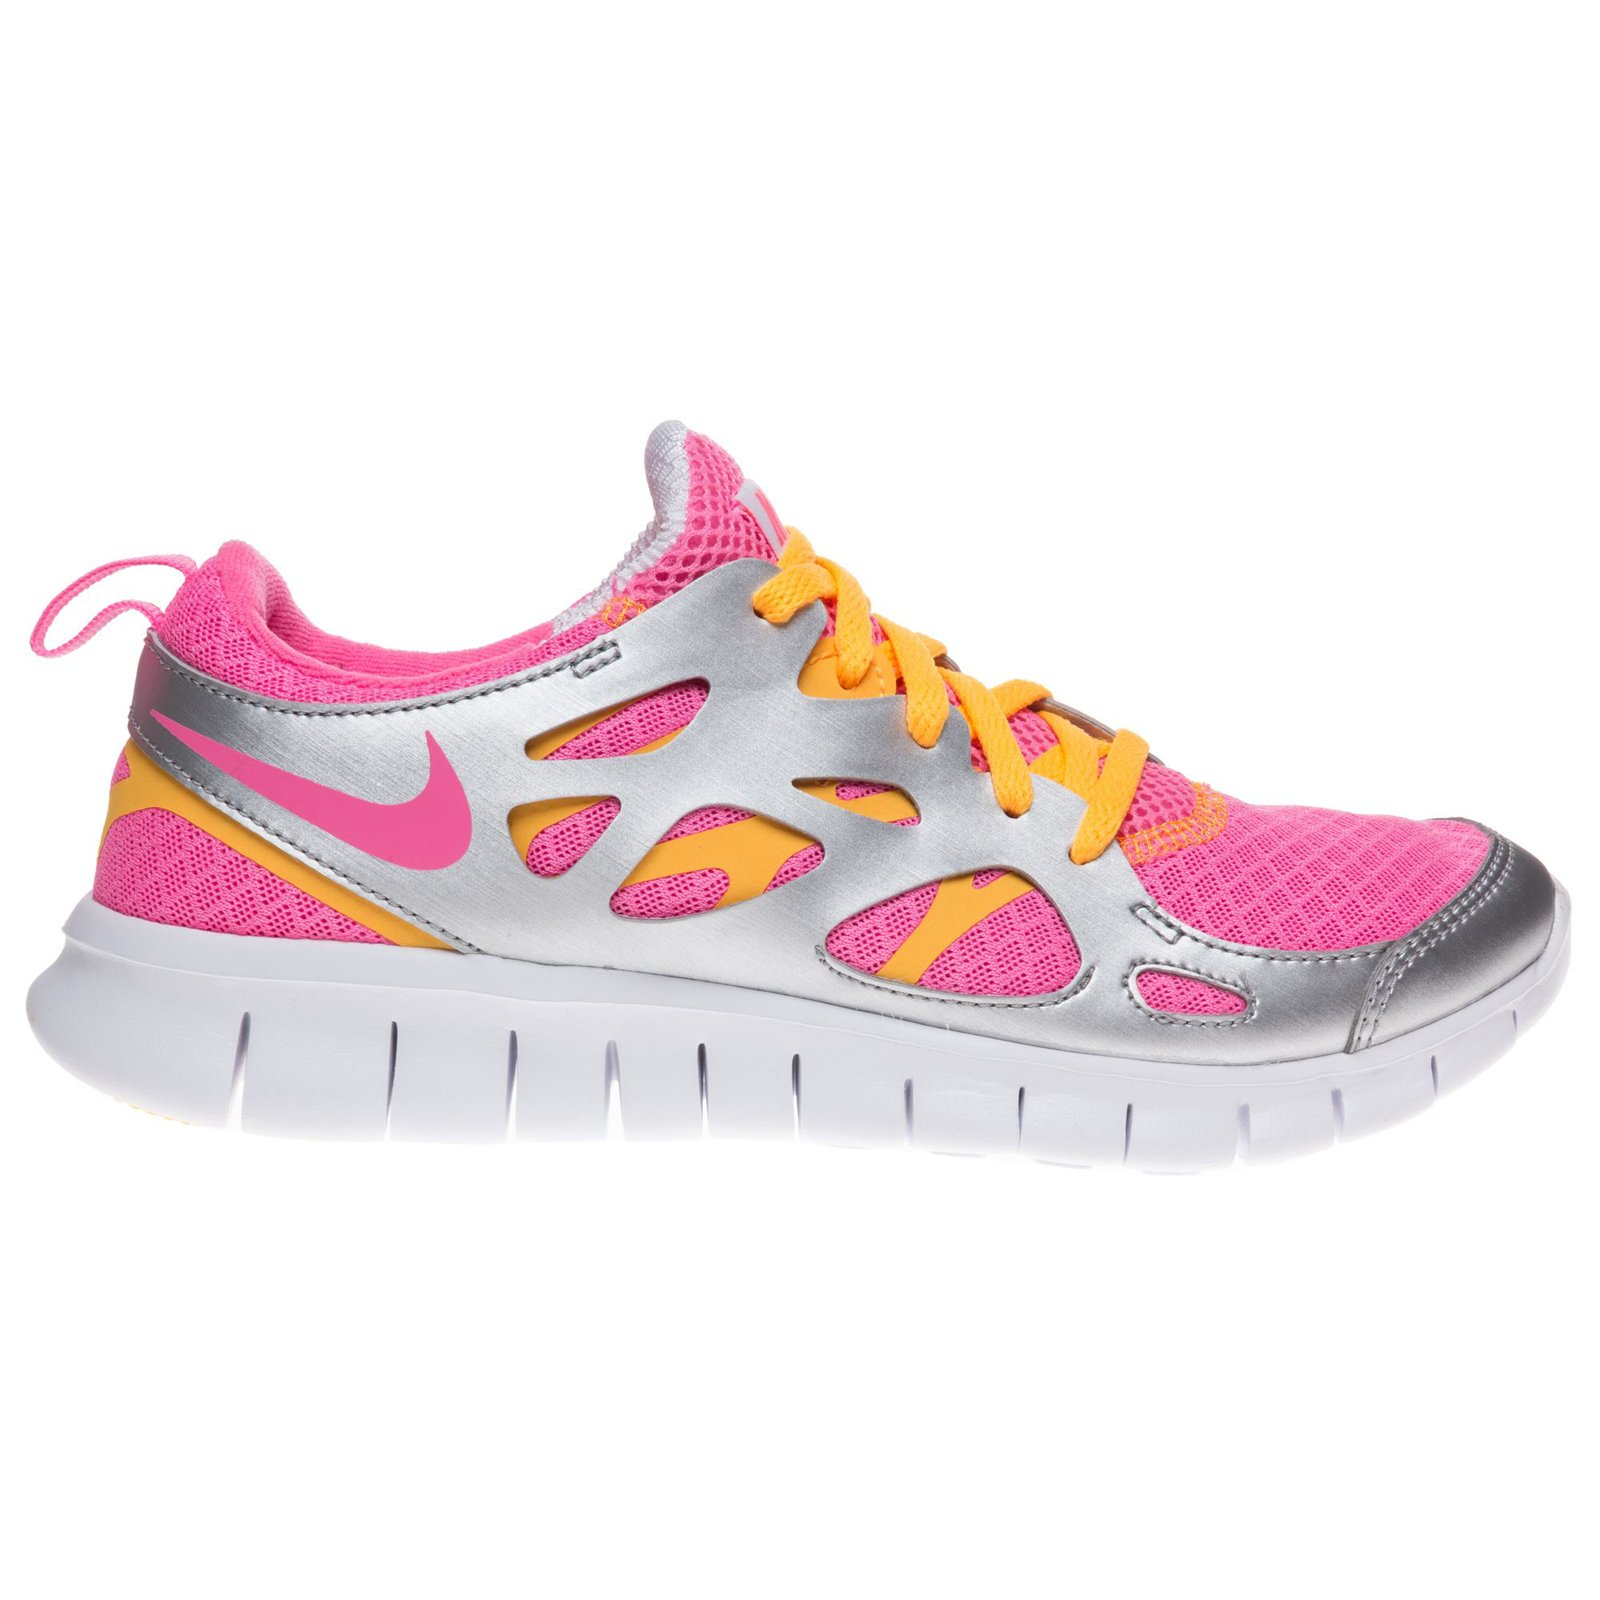 5c7db640920ef Galleon - Nike Free Run 2 (PSV) Kids Trainers 477702 Sneakers Shoes (uk 1.5  Us 2Y Eu 33.5